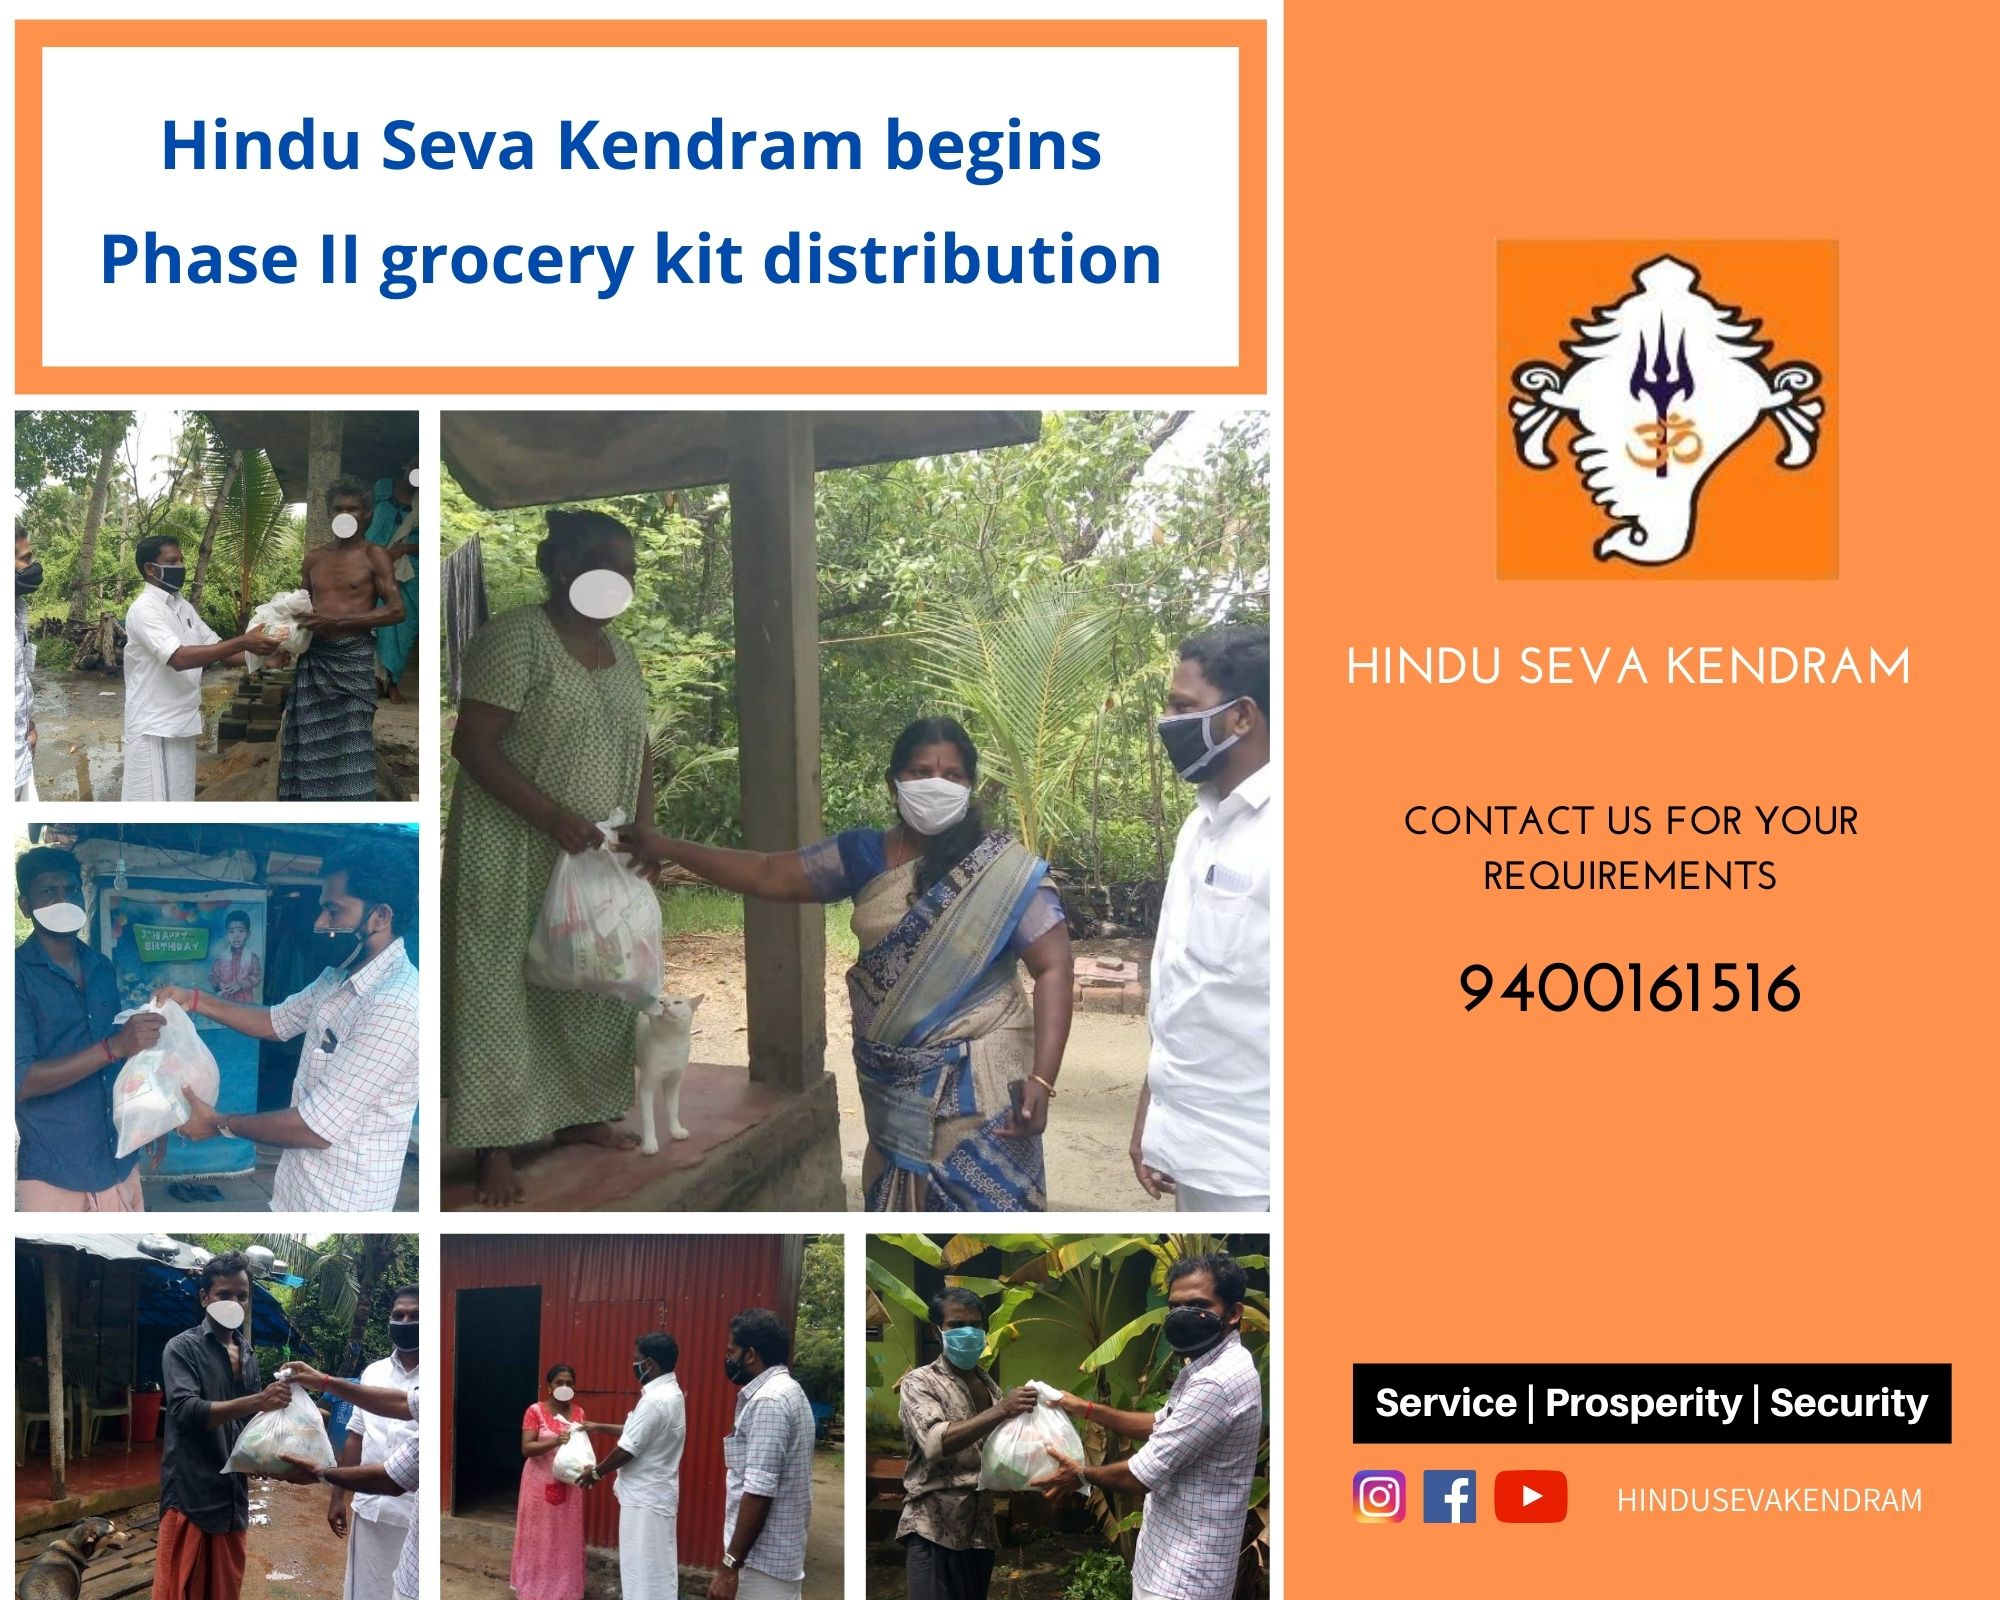 Hindu Seva Kendram begins Phase II grocery kit distribution